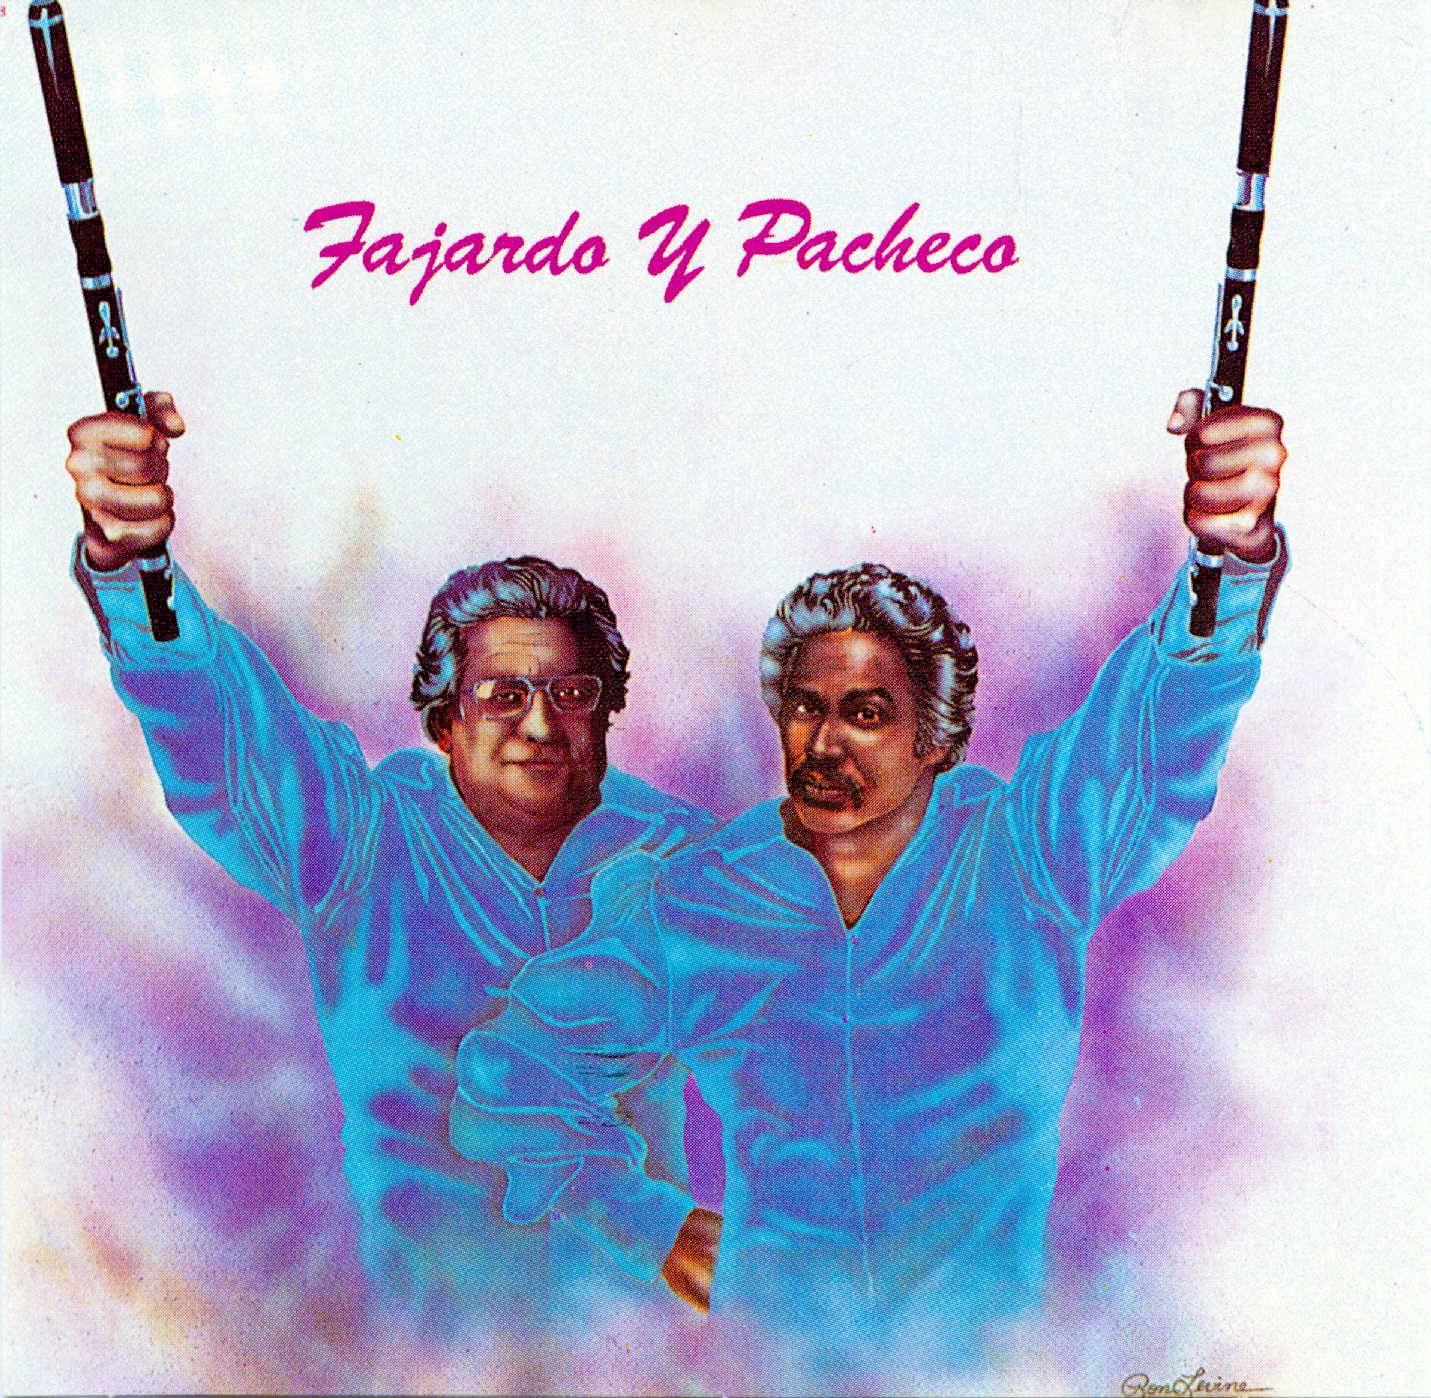 Johnny Pacheco - Fajardo y Pacheco   (1990)